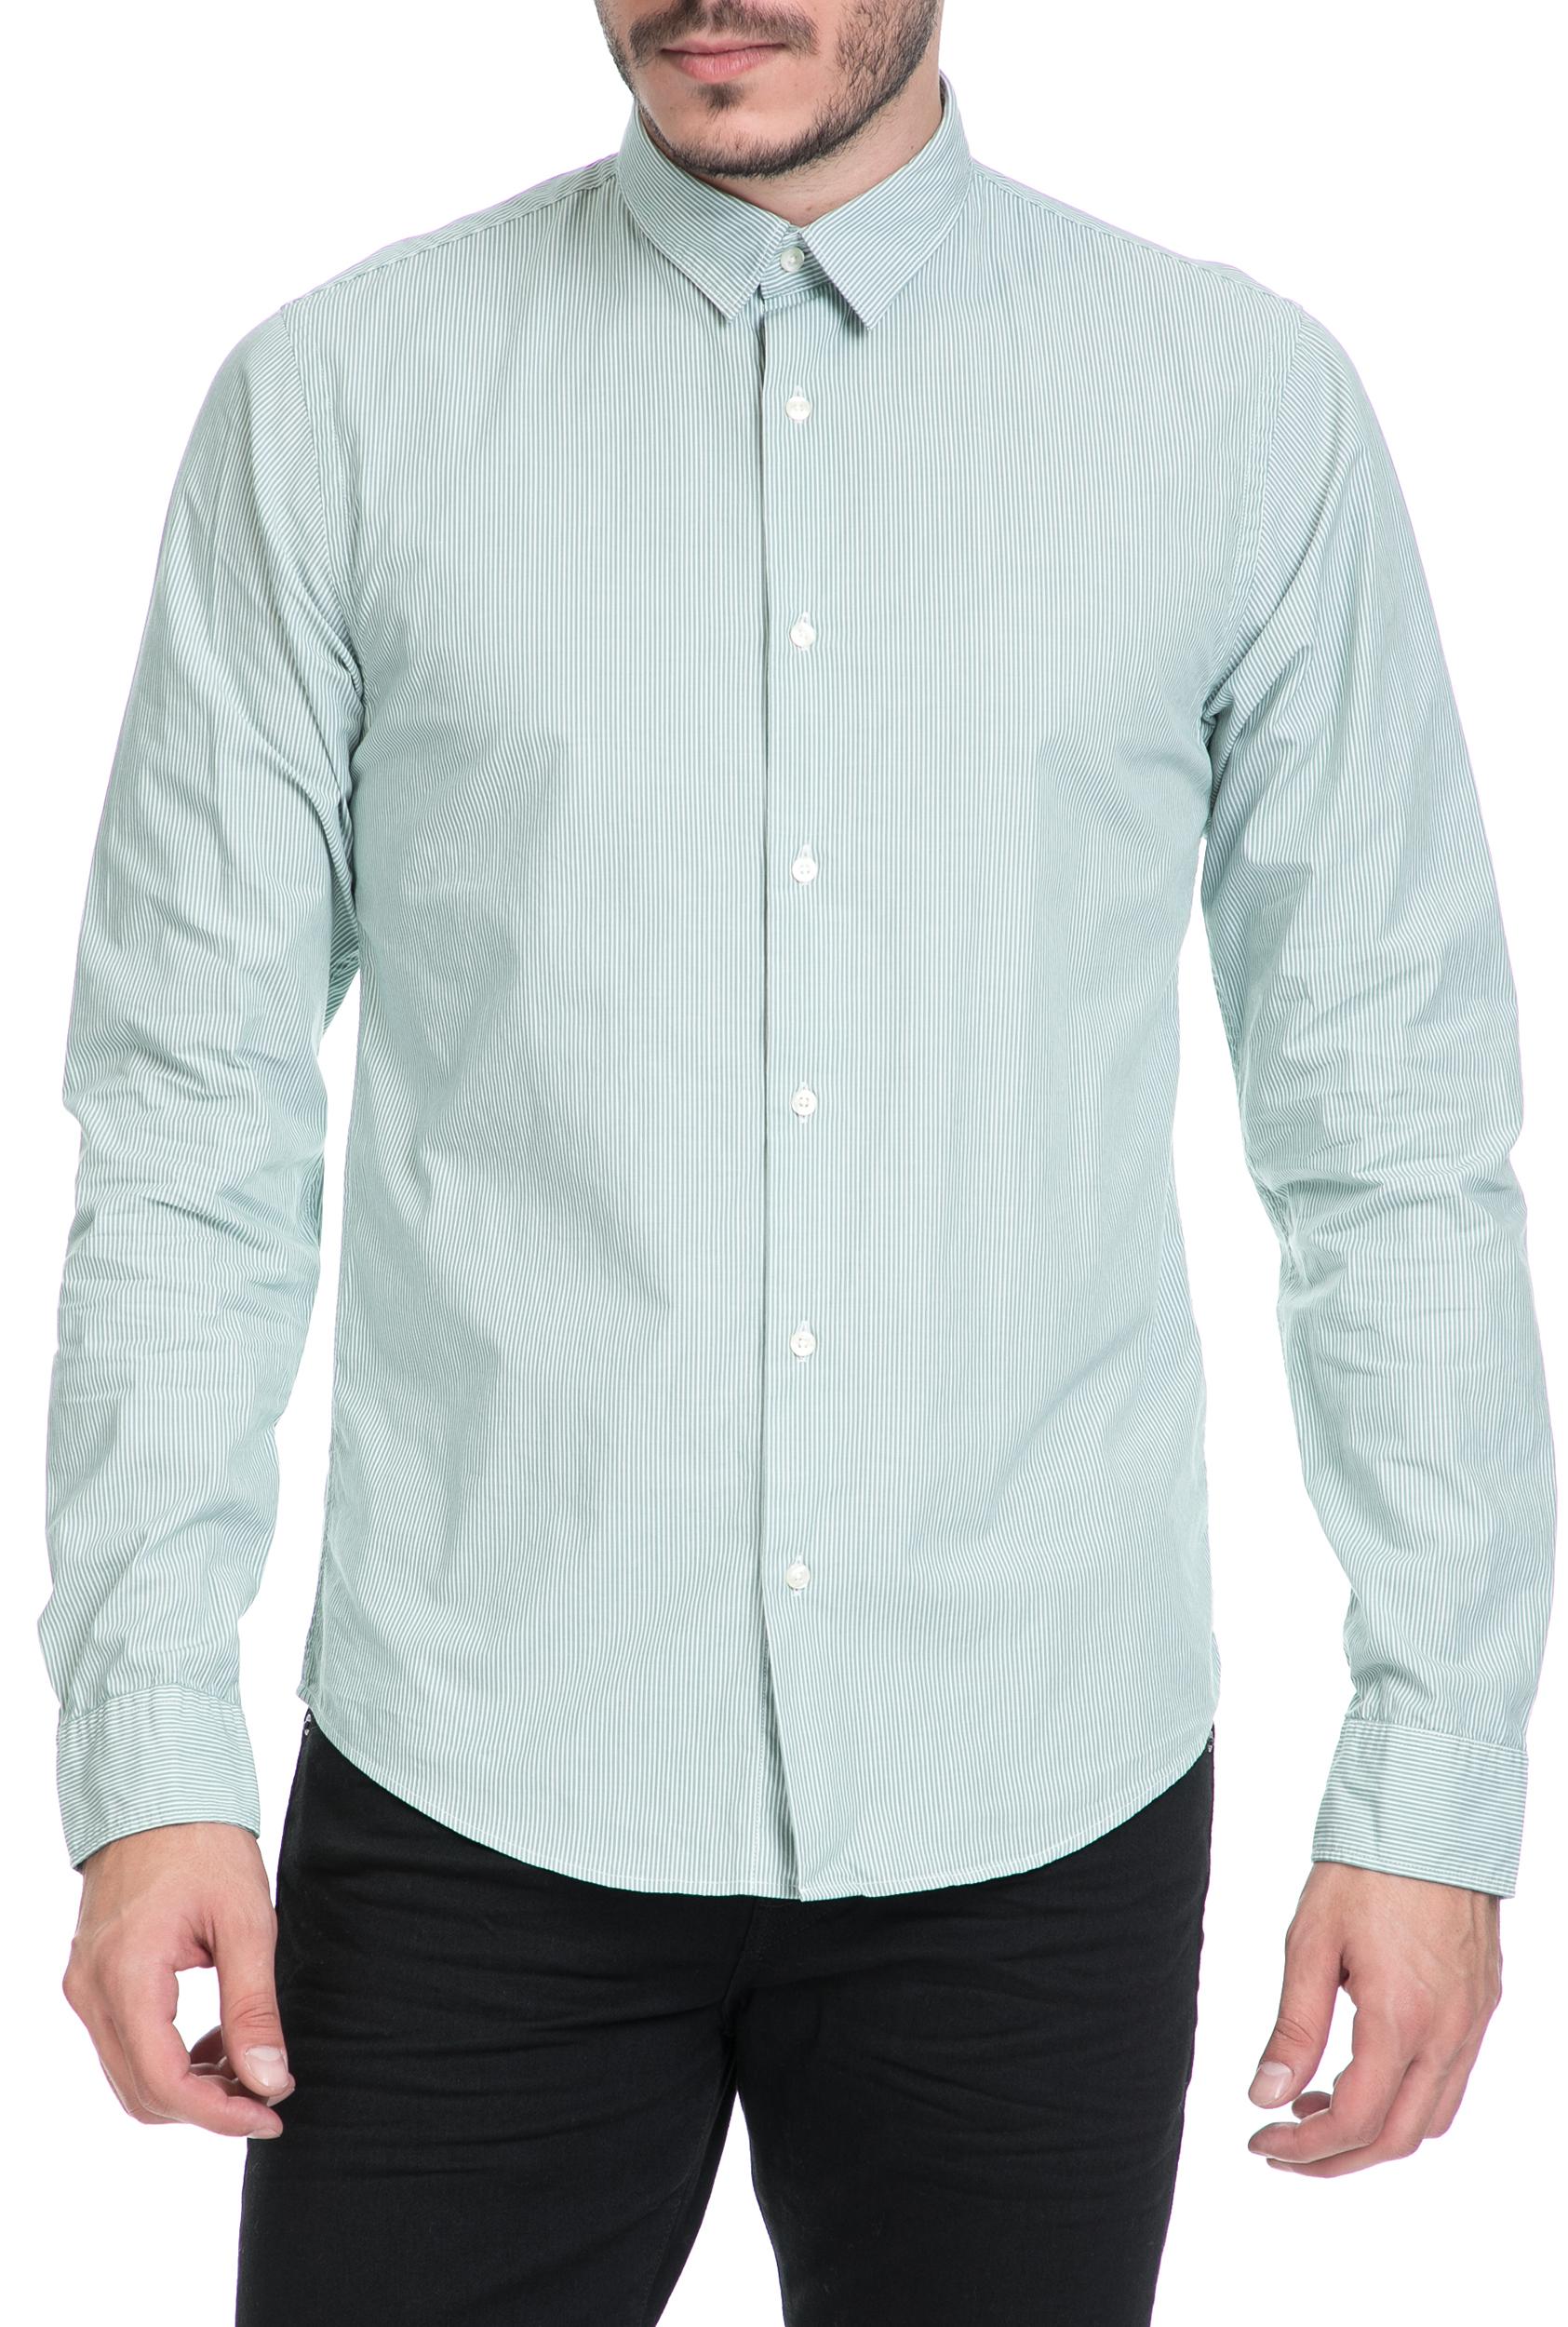 SCOTCH & SODA - Ανδρικό πουκάμισο SCOTCH & SODA λευκό-πράσινο ανδρικά ρούχα πουκάμισα μακρυμάνικα